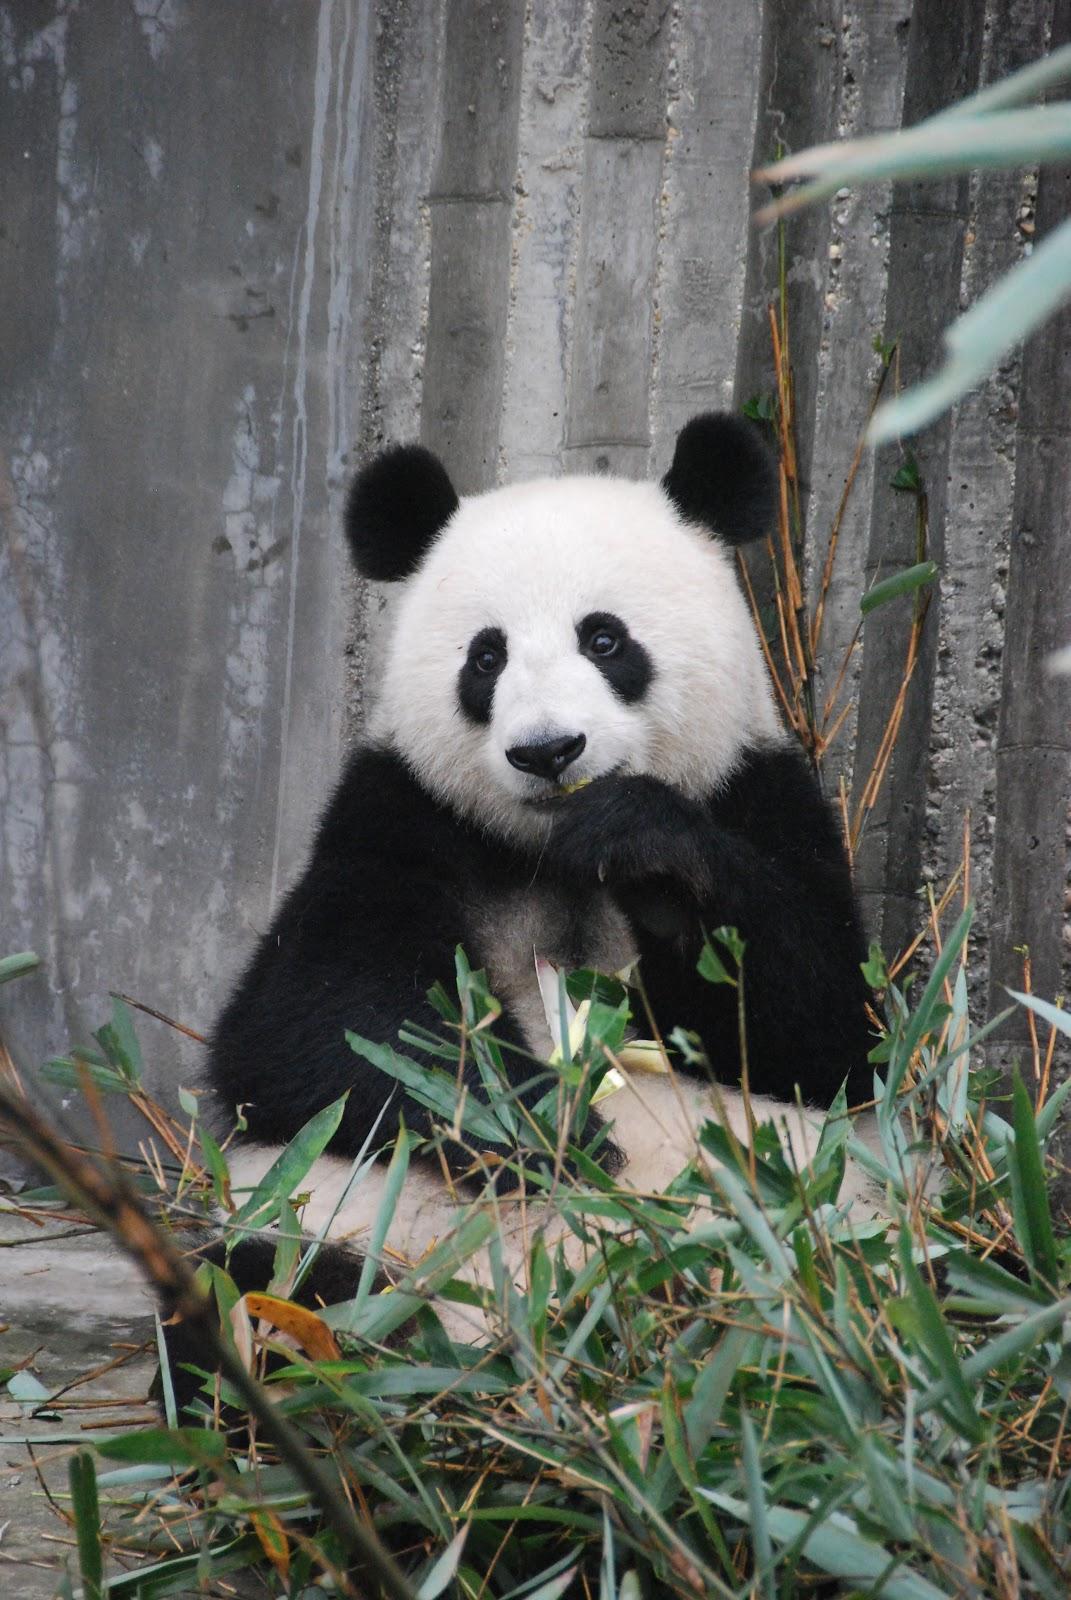 https://upload.wikimedia.org/wikipedia/commons/3/3e/Panda-bear-on-green-grass-3608263.jpg